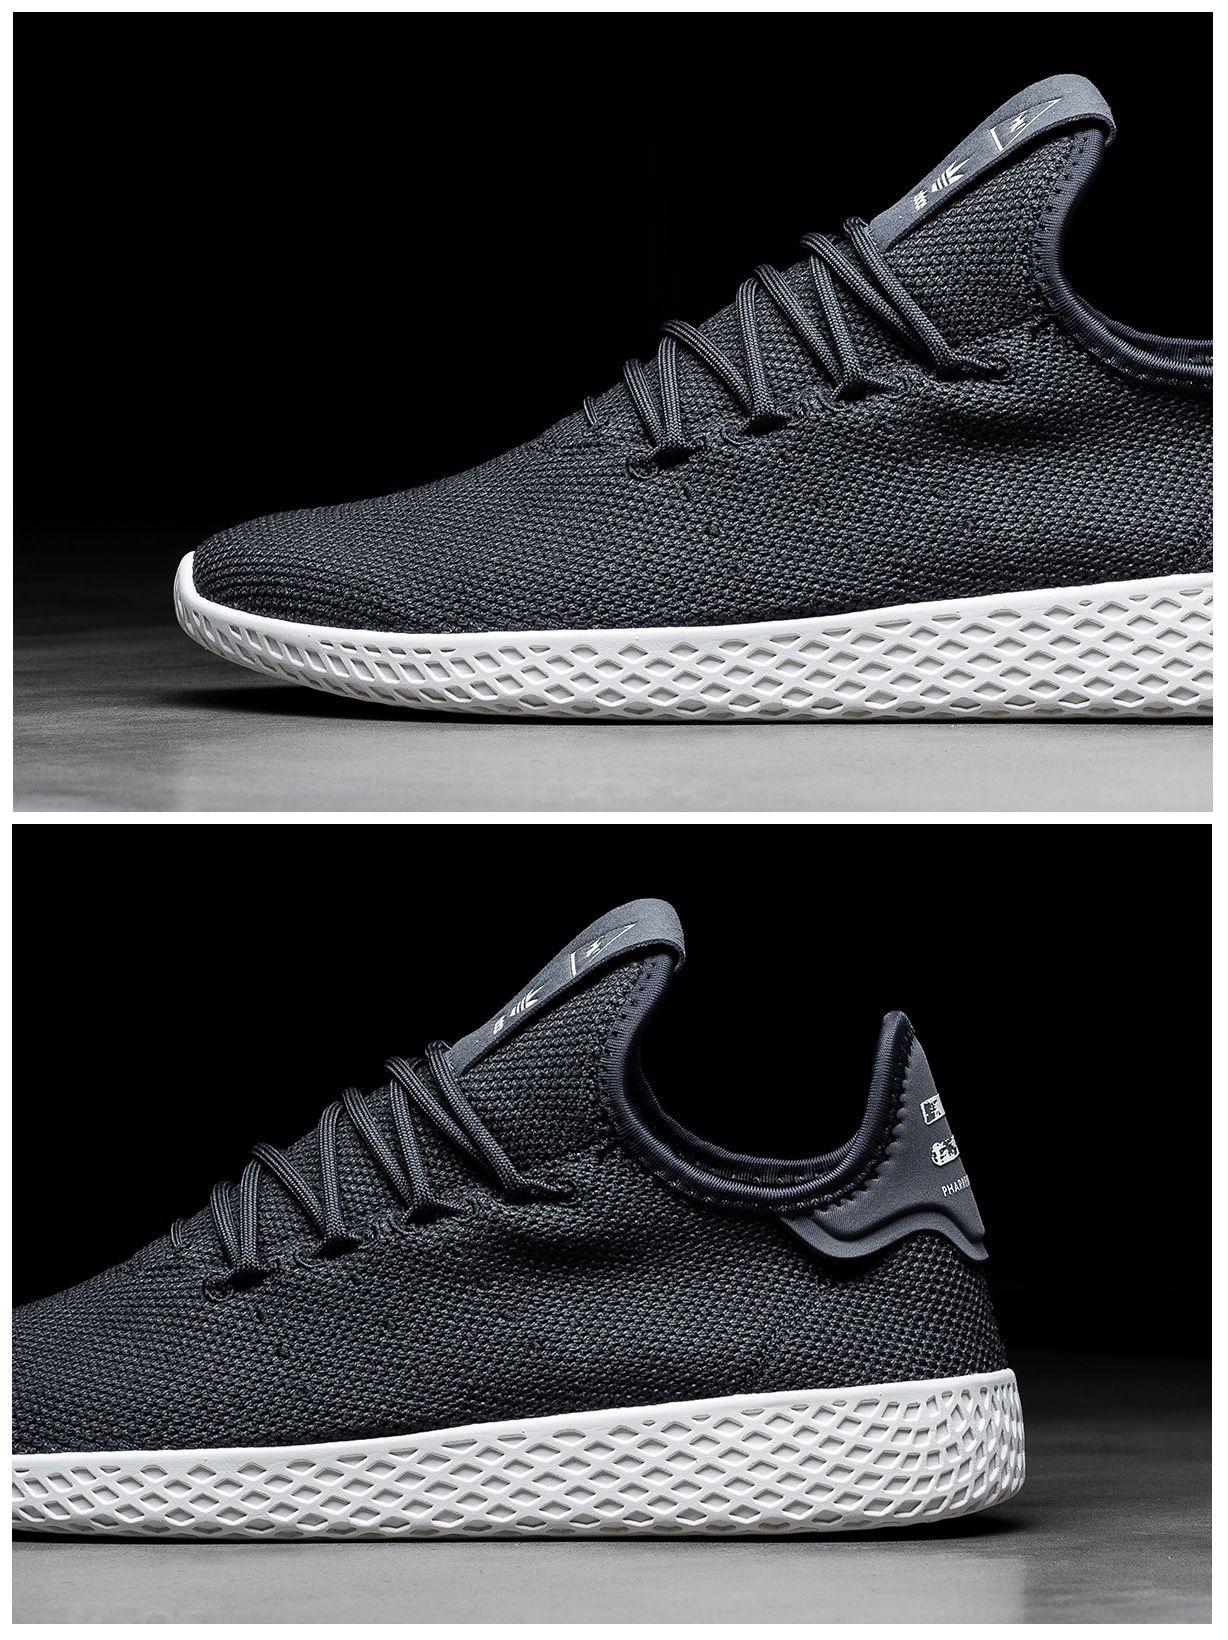 90d018c593a46 Pharrell x adidas Originals NMD HU Tennis Tennis Sneakers